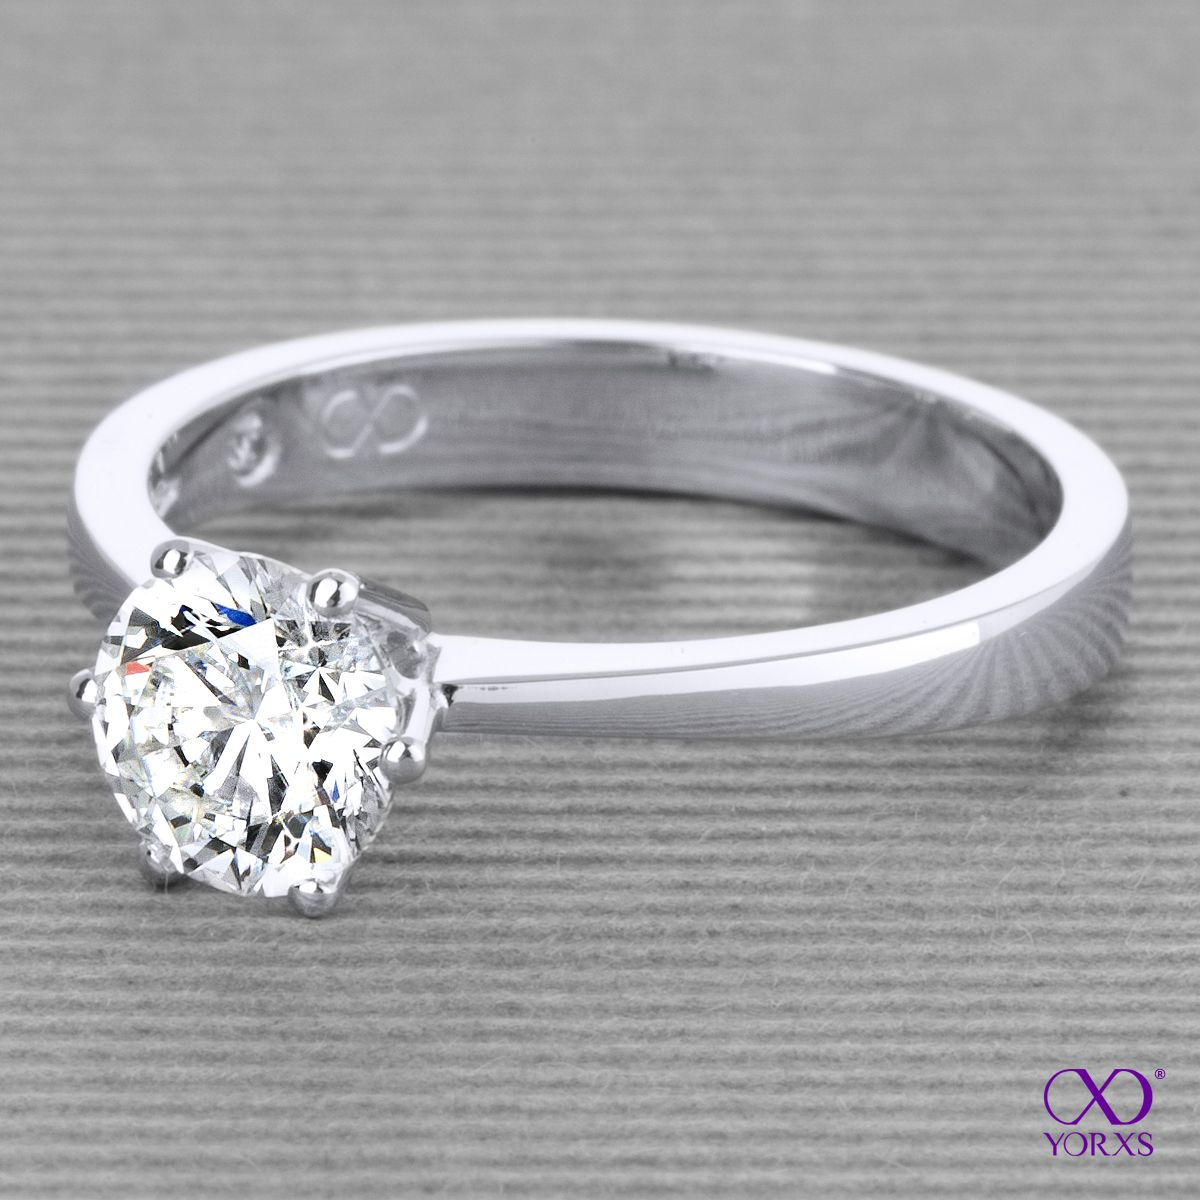 Flora In Whitegold Yorxs Diamonds Diamond Weissgold Diamant